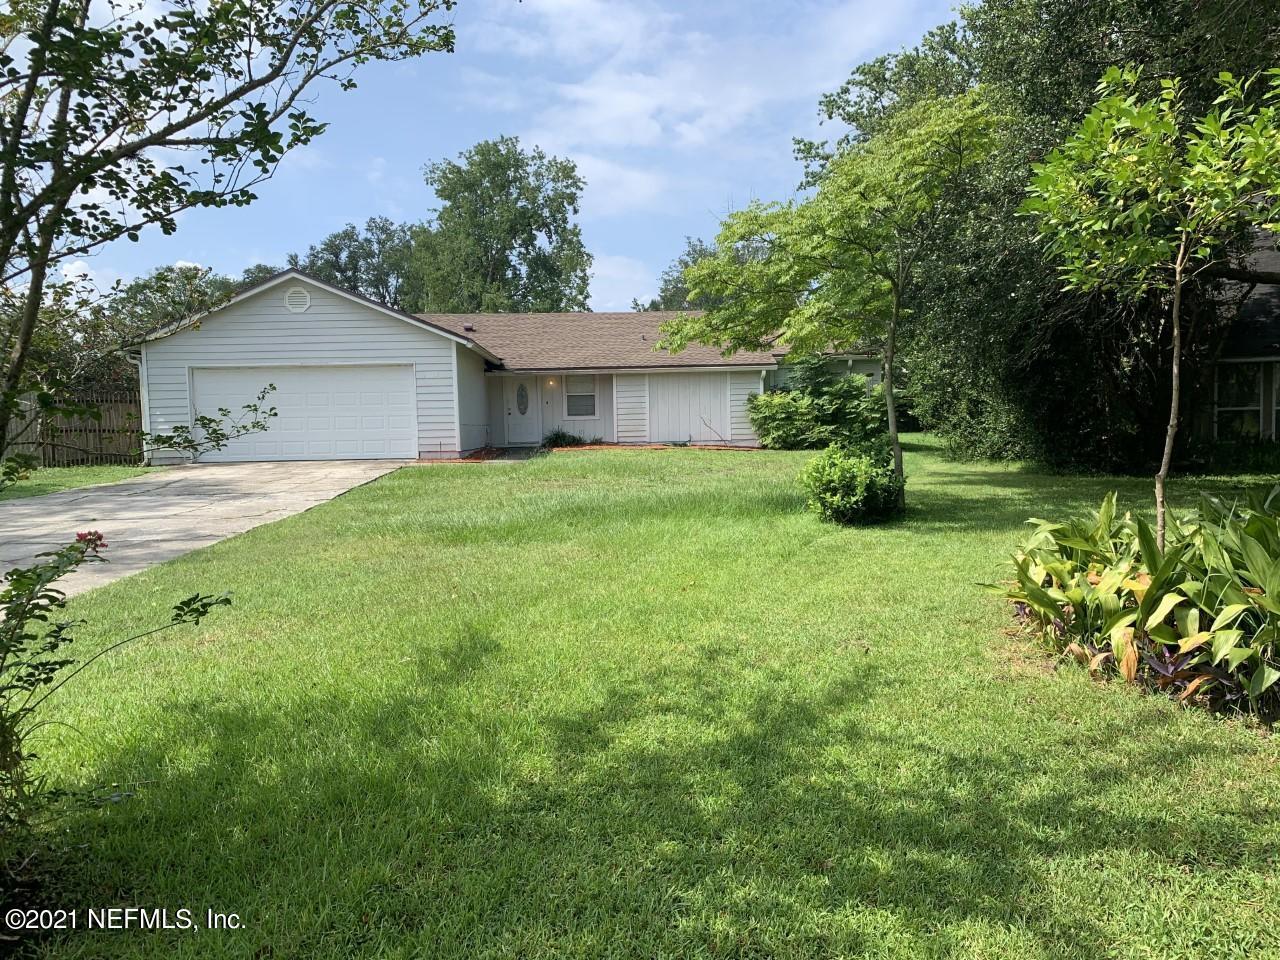 655 CHARLES CARROLL, ORANGE PARK, FLORIDA 32073, 3 Bedrooms Bedrooms, ,2 BathroomsBathrooms,Residential,For sale,CHARLES CARROLL,1123840